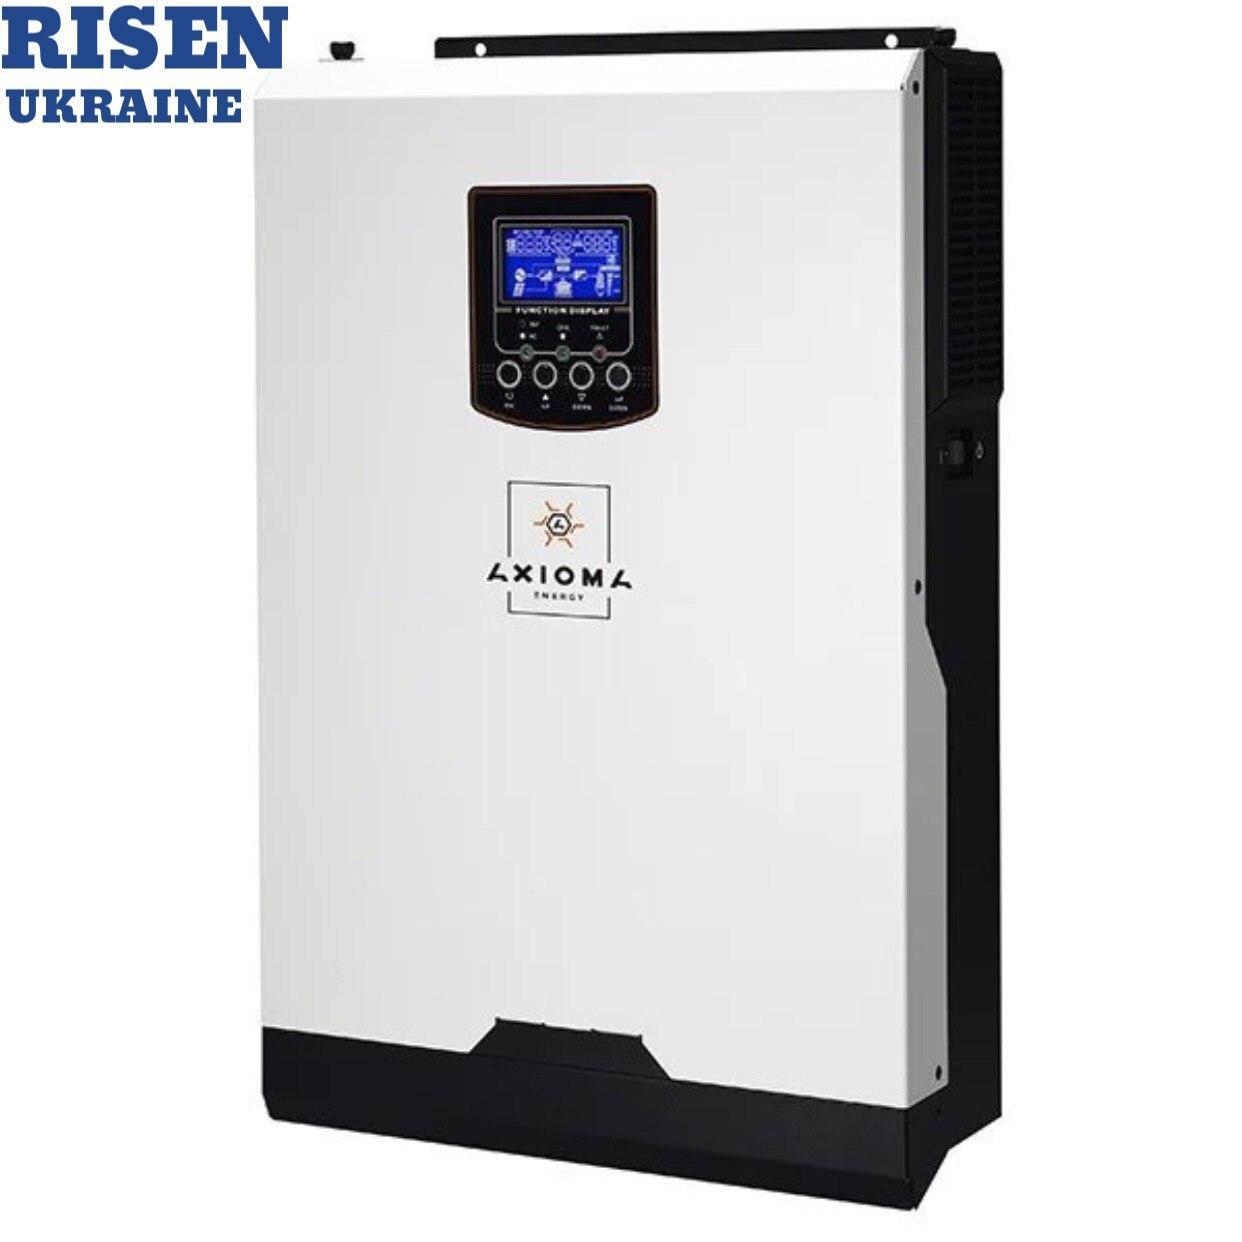 (ПРЕДЗАКАЗ!!) Гибридный ИБП 5000Вт, 48В + МППТ контроллер 80А, ISMPPT BF (Battery Free) 5000, AXIOMA energy